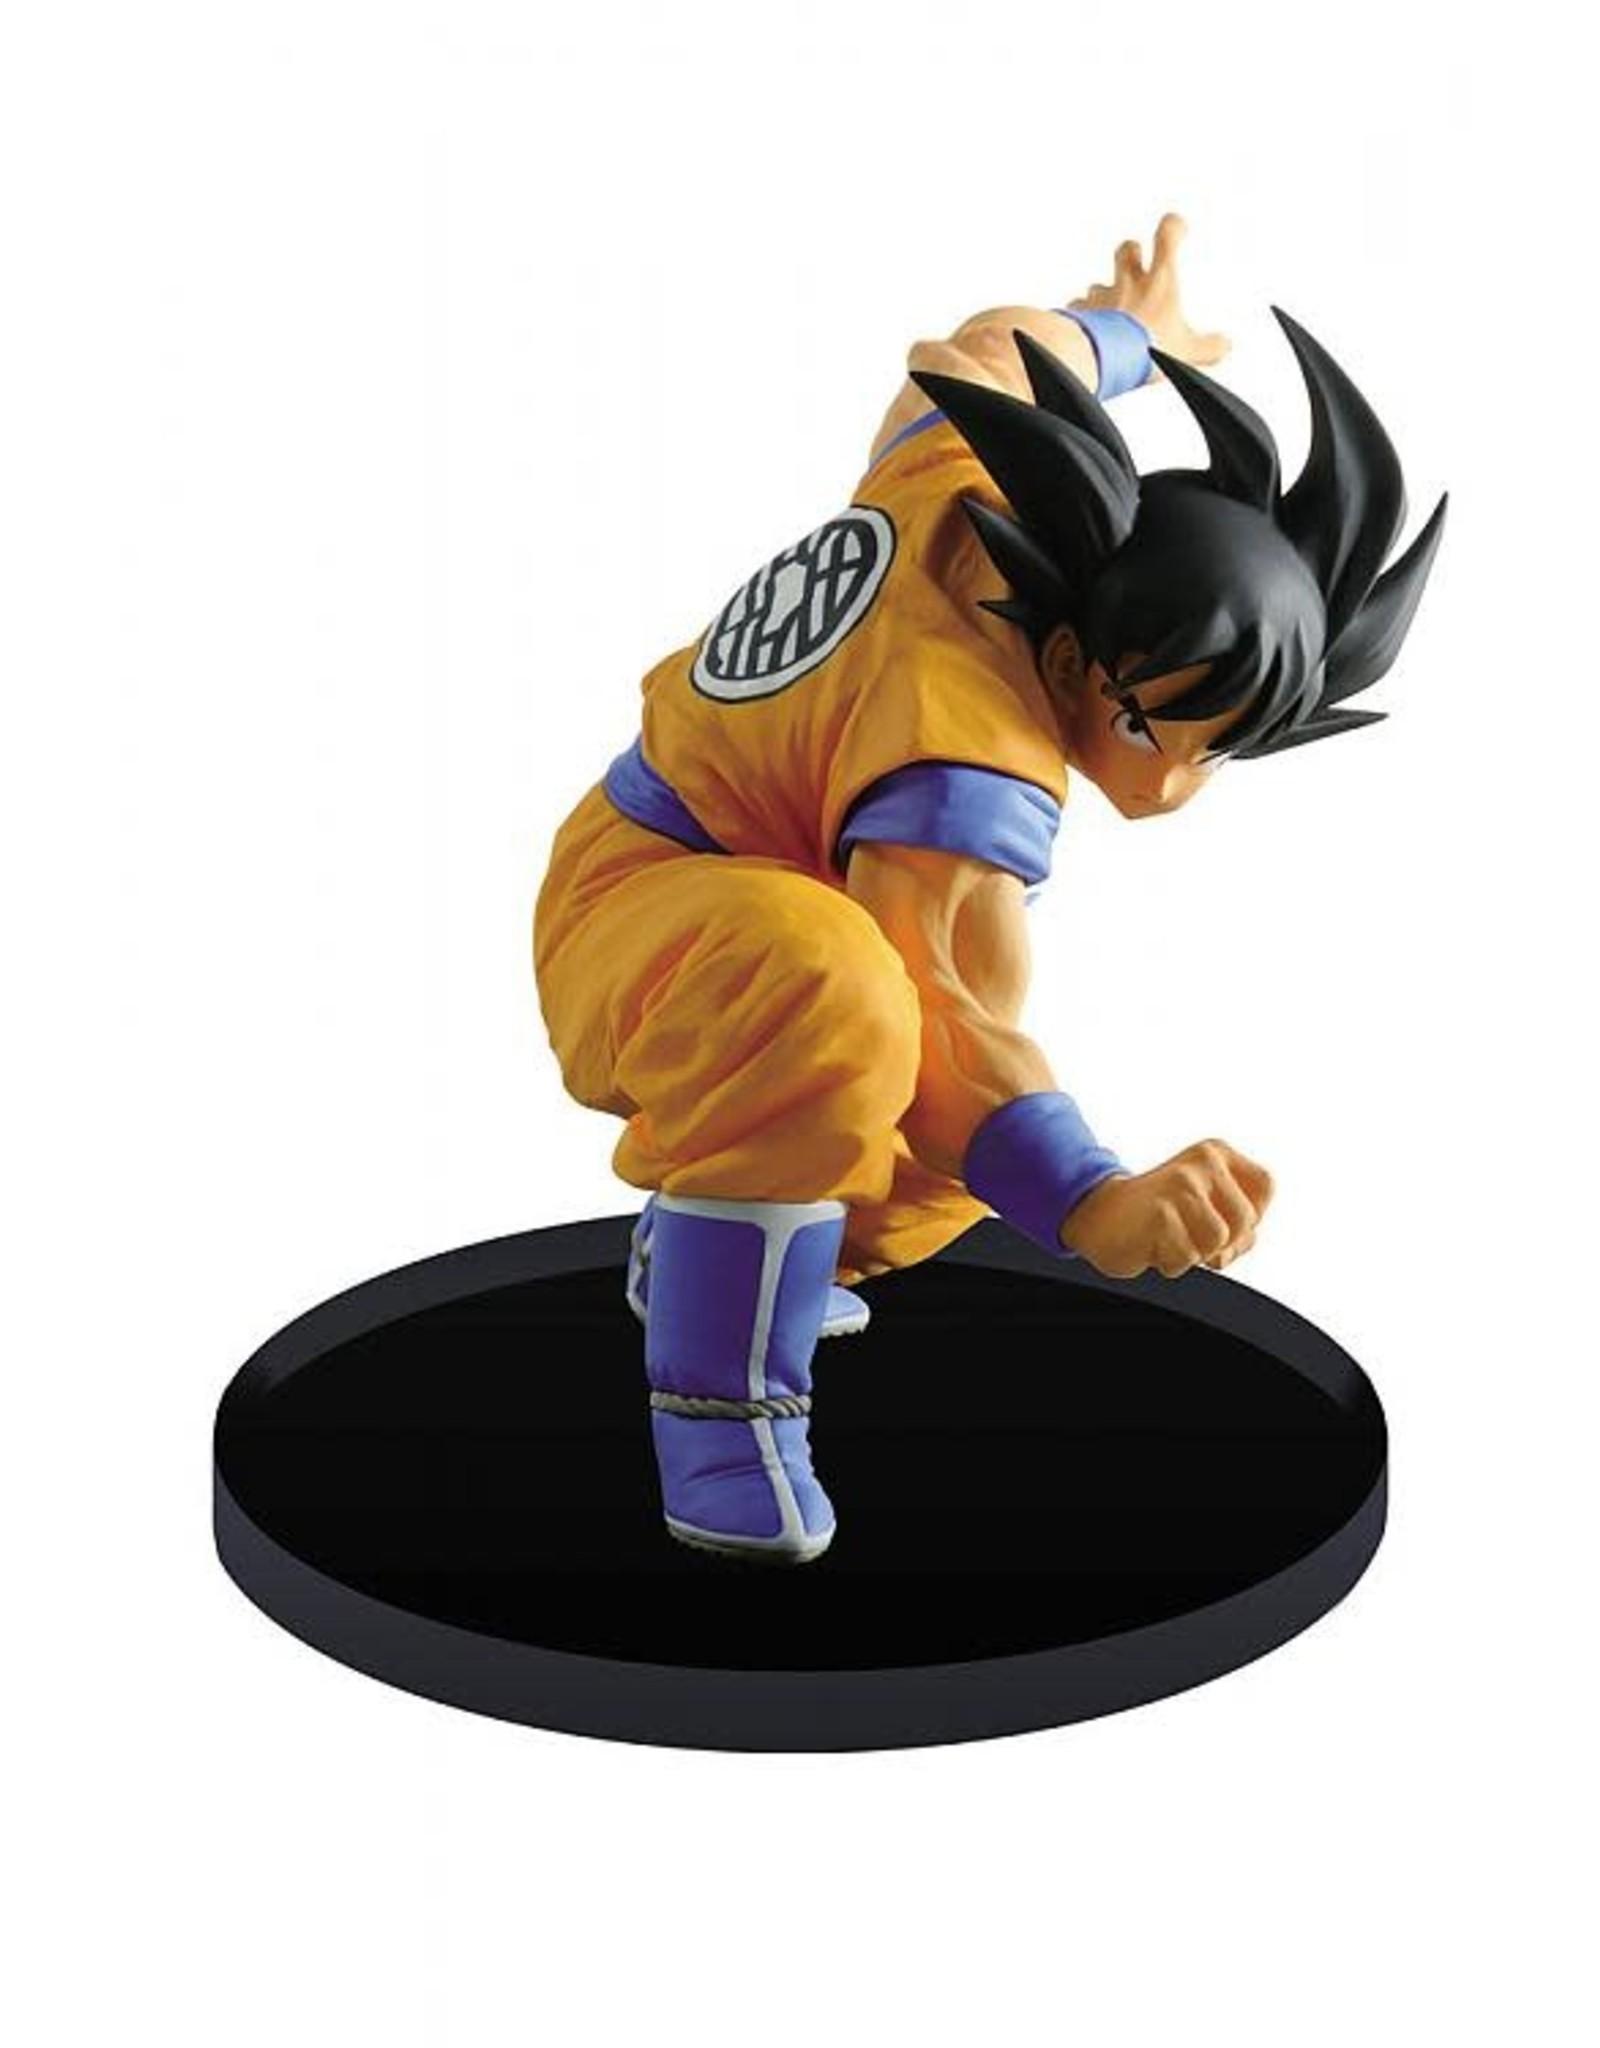 Banpresto DRAGON BALL Z SCultures Figure Big Budoukai 7 9cm - Son Goku